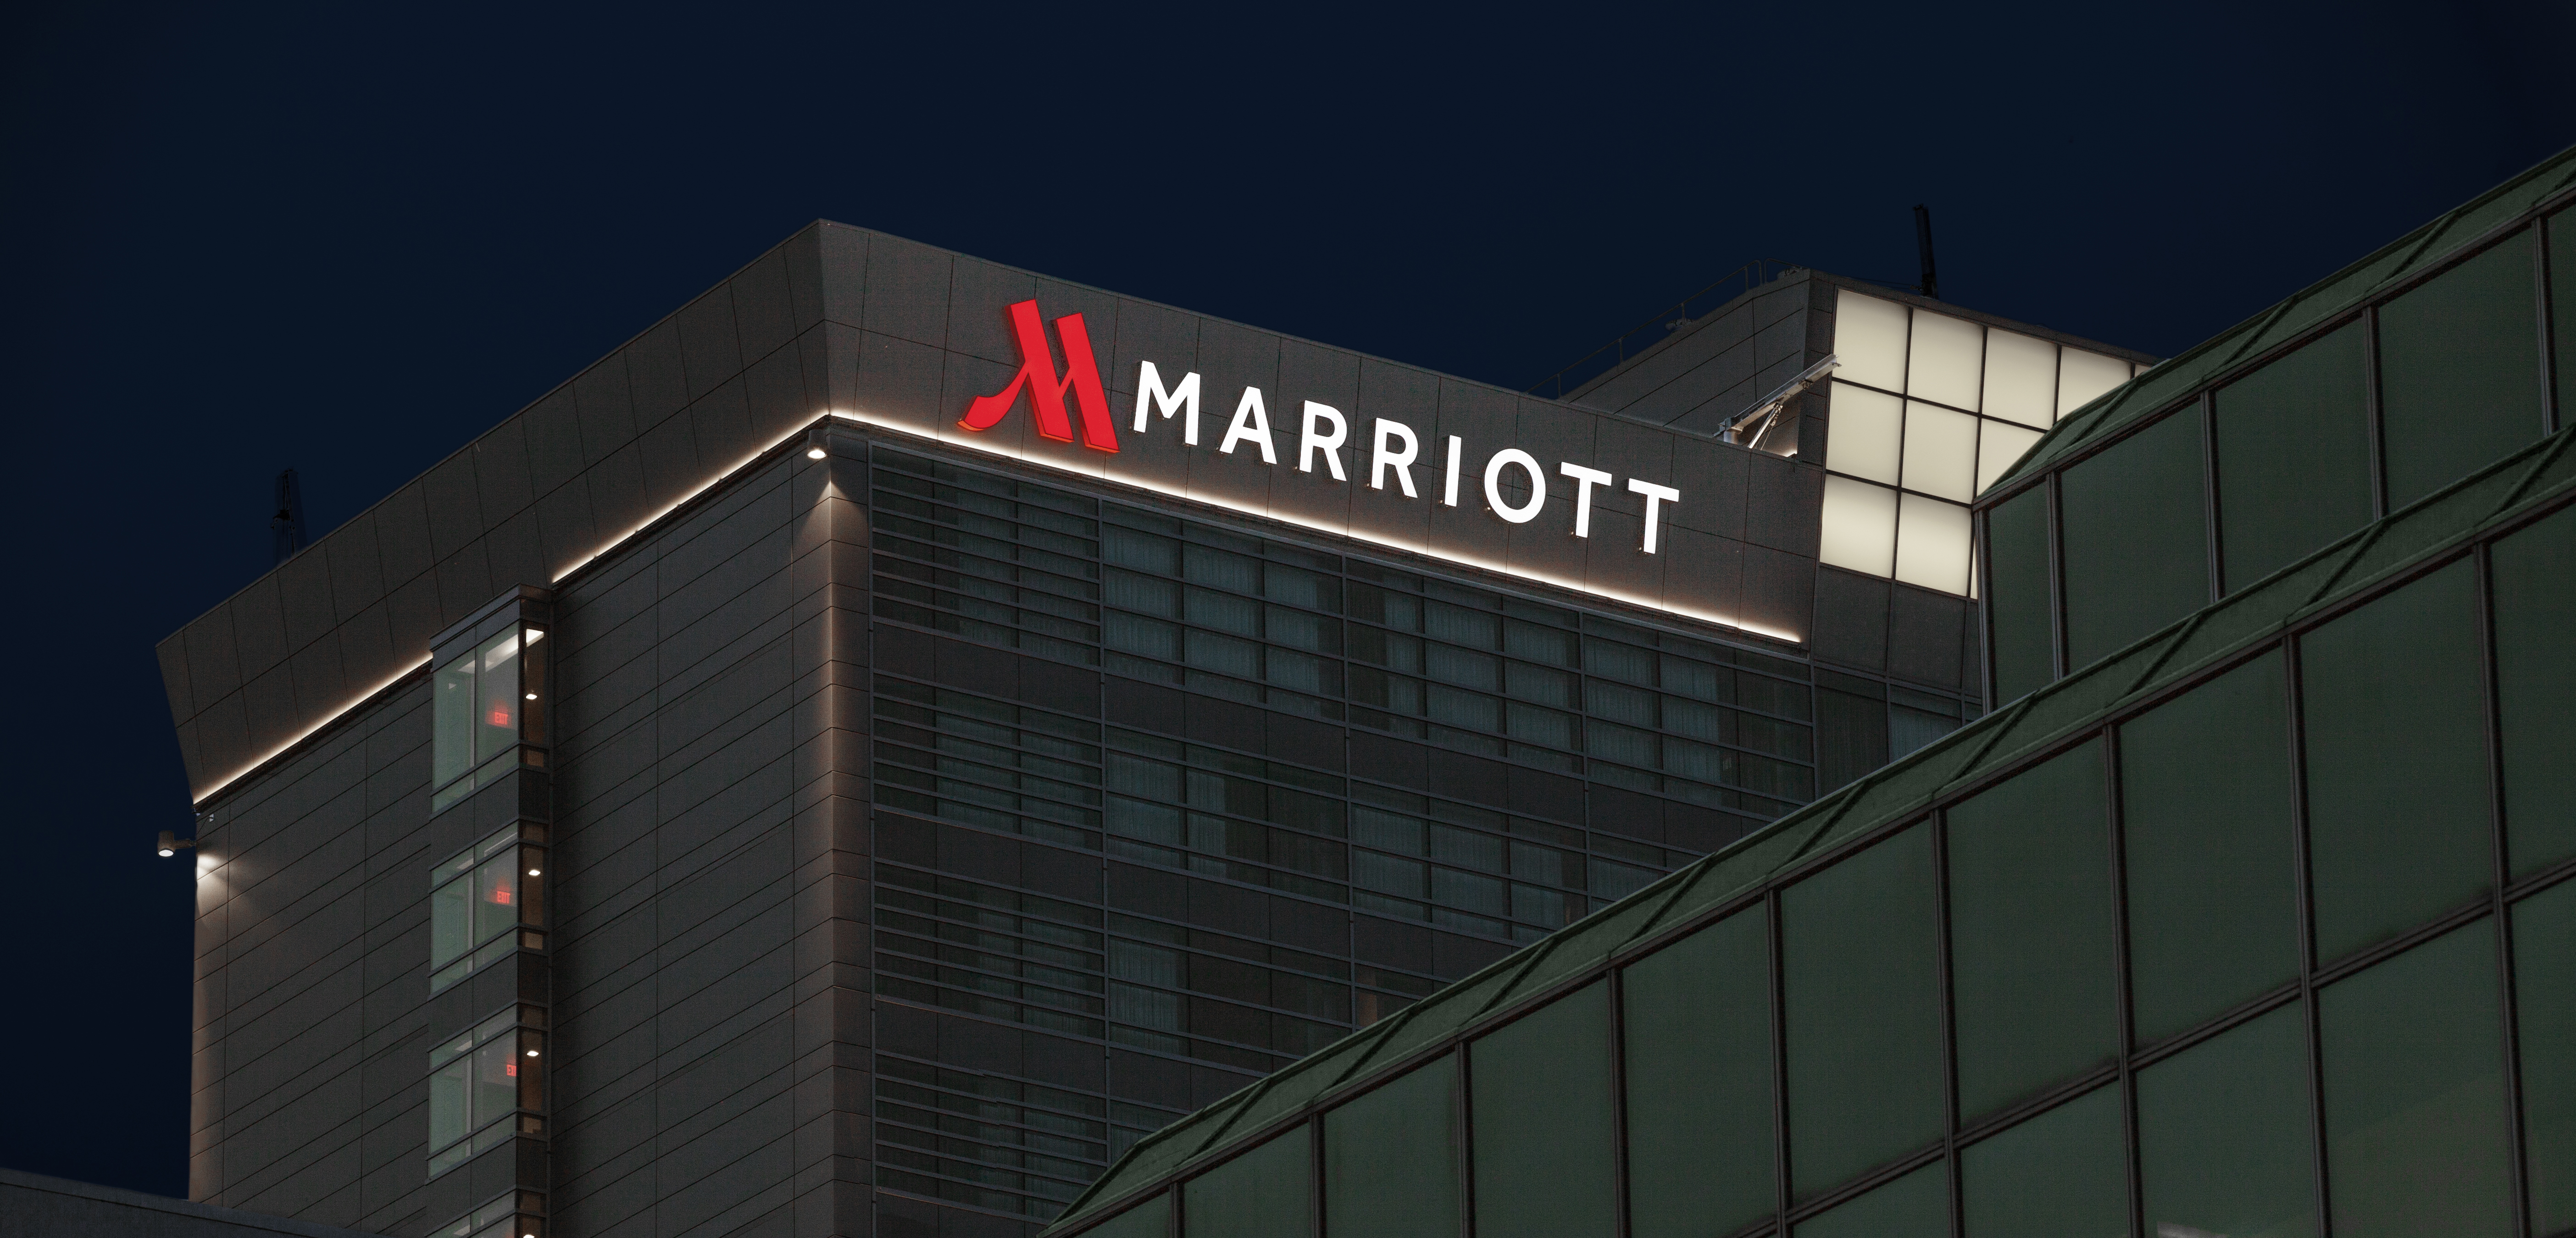 Marriott - LECOM Center Channel Letter Sign edit